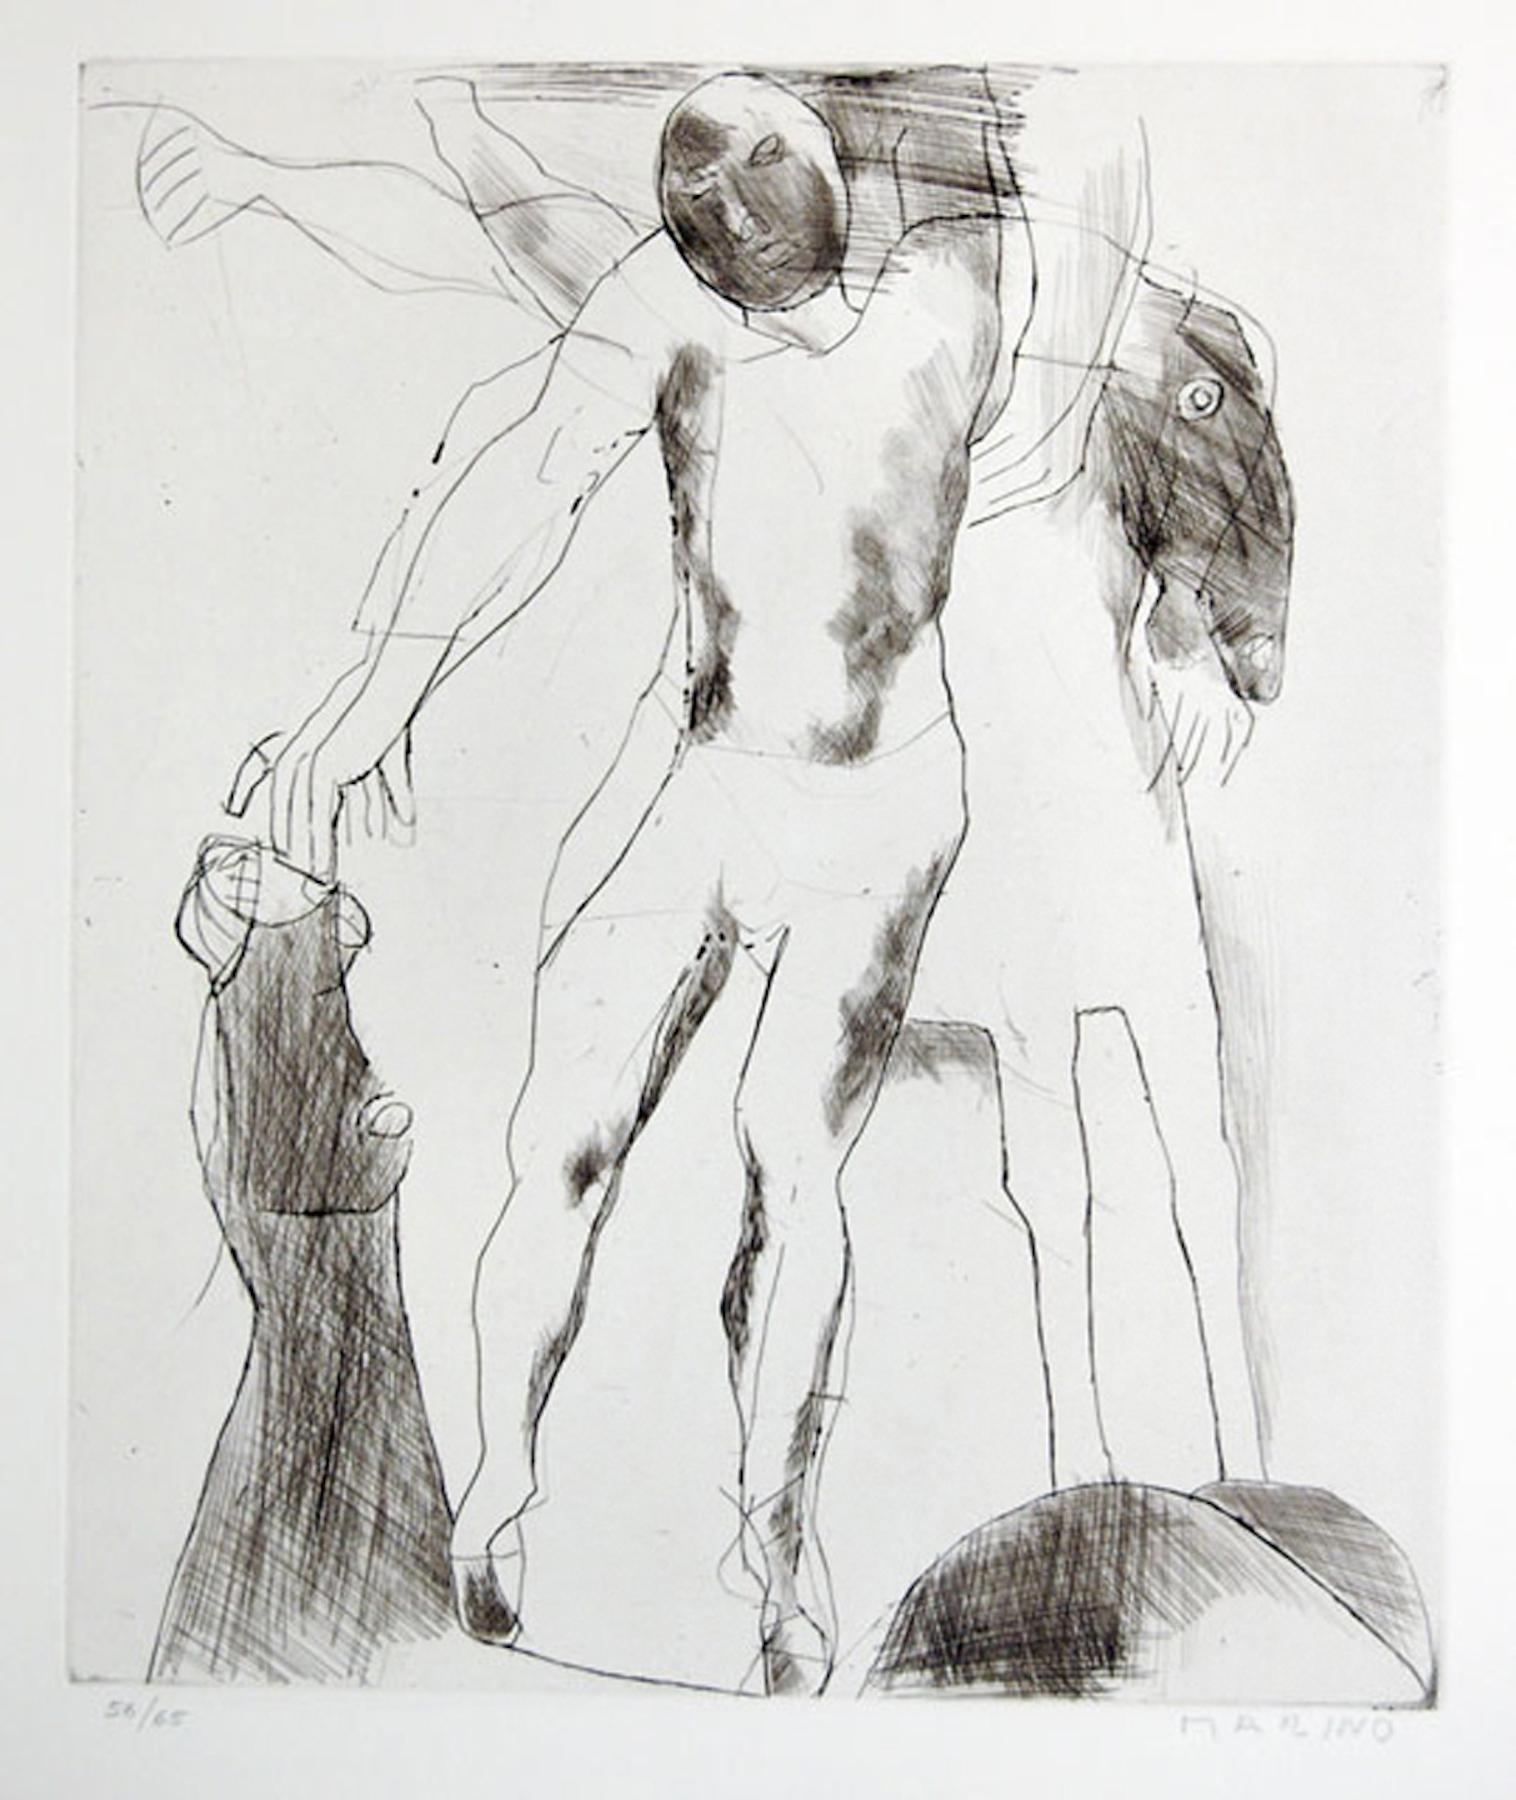 Jugglers V - Original Etching by Marino Marini - 1969